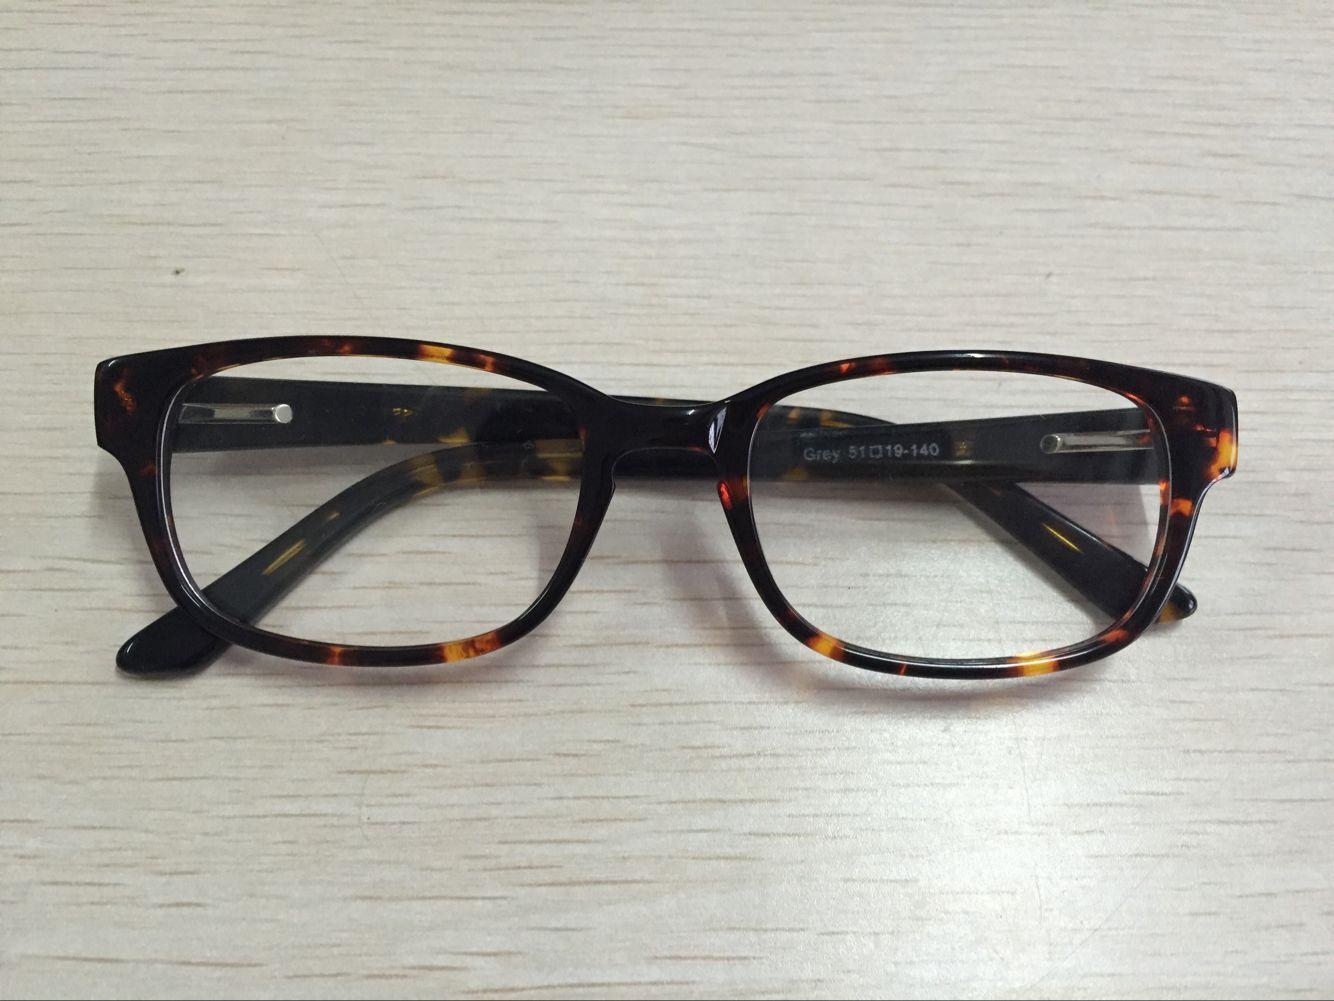 2018 High Quality Vintage Glasses Frame For Men Women Acetate Square ...